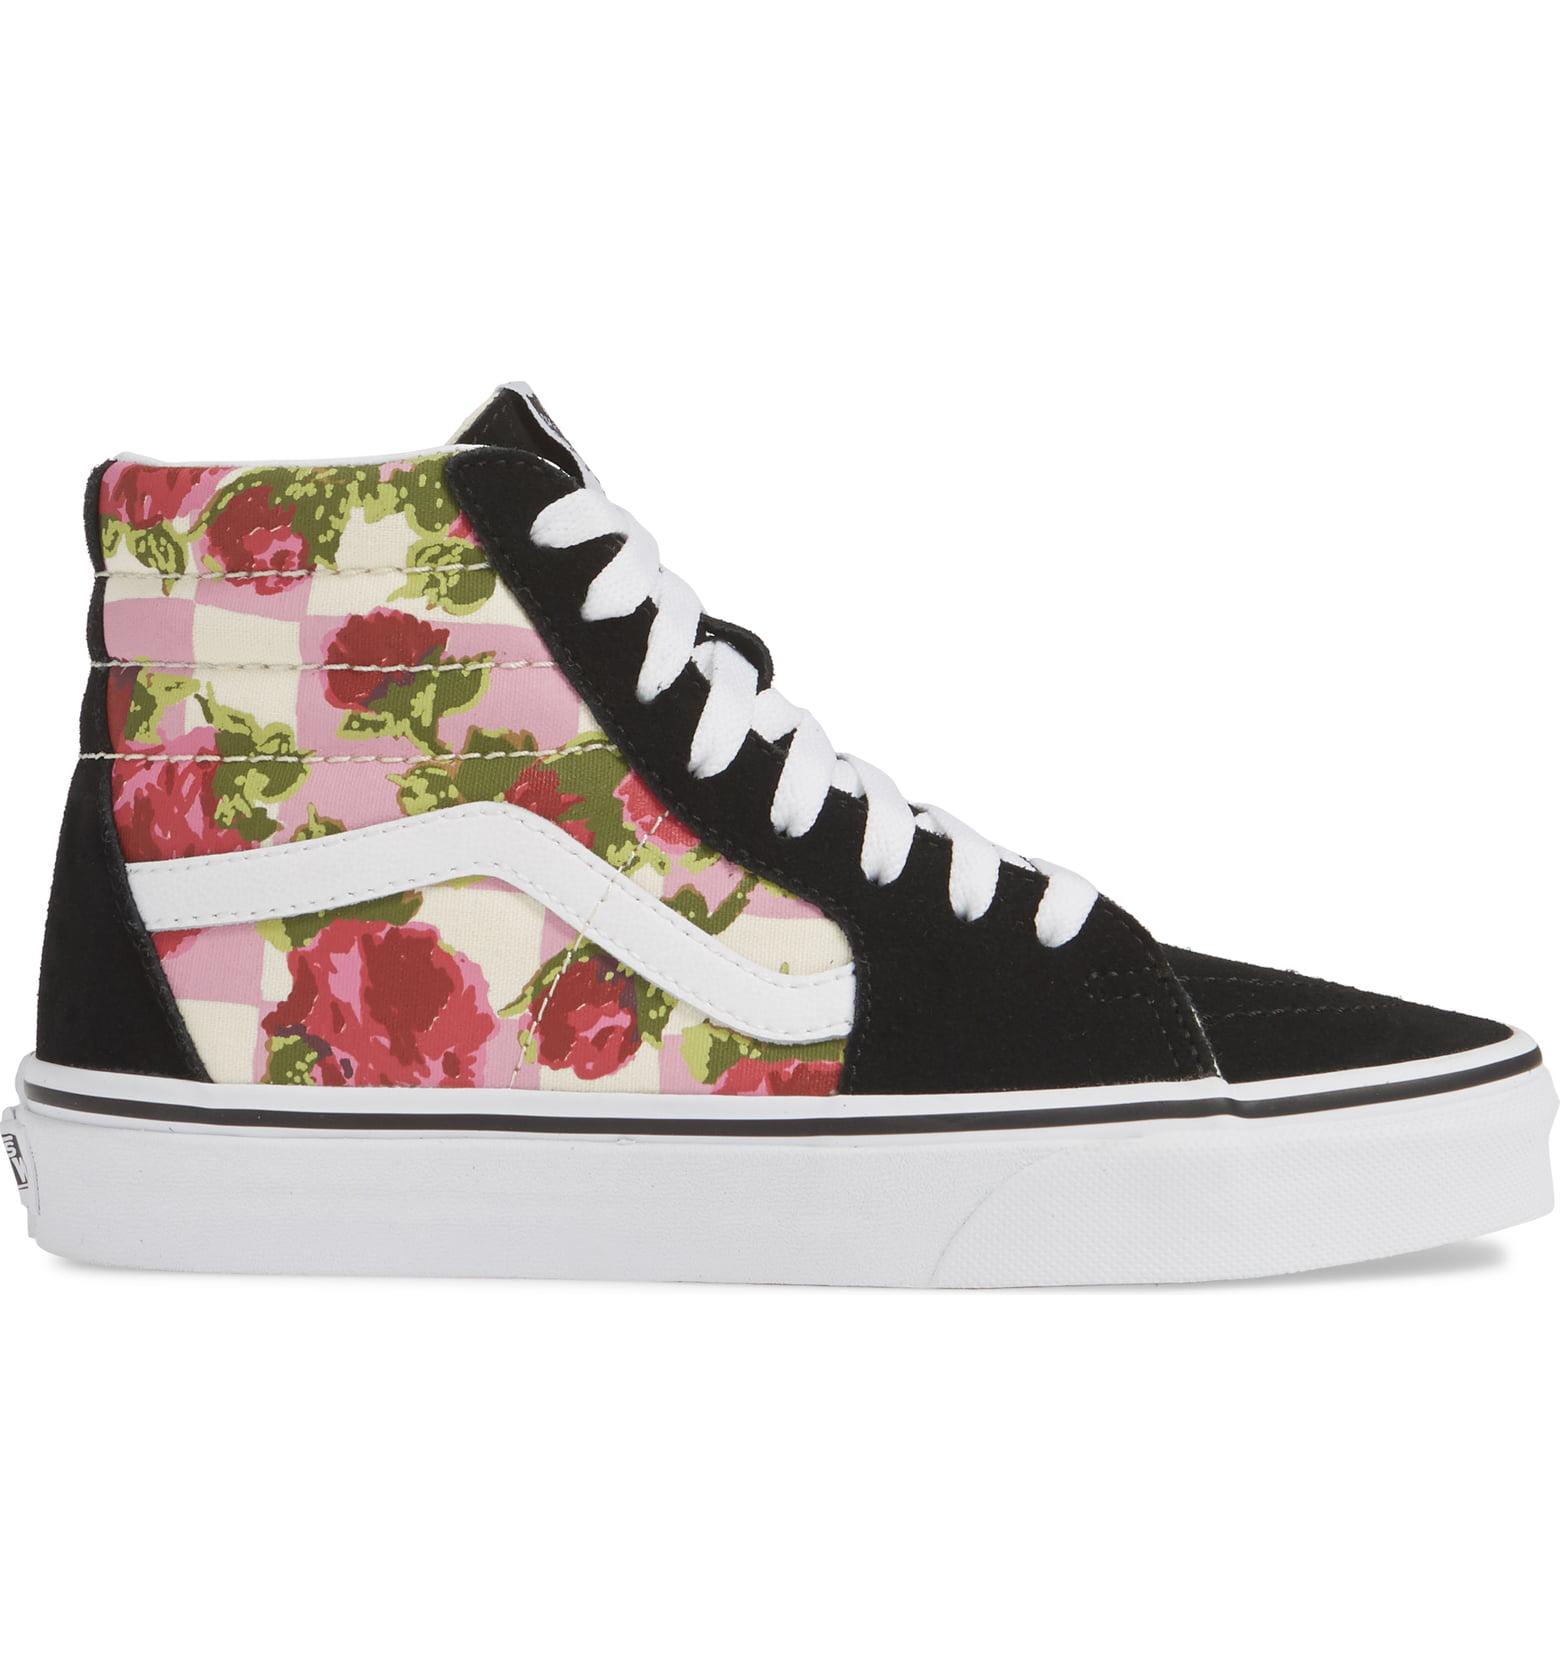 4d04ba0eab9 Vans Sk8-Hi Floral Sneaker In Floral Multi/ True White | ModeSens